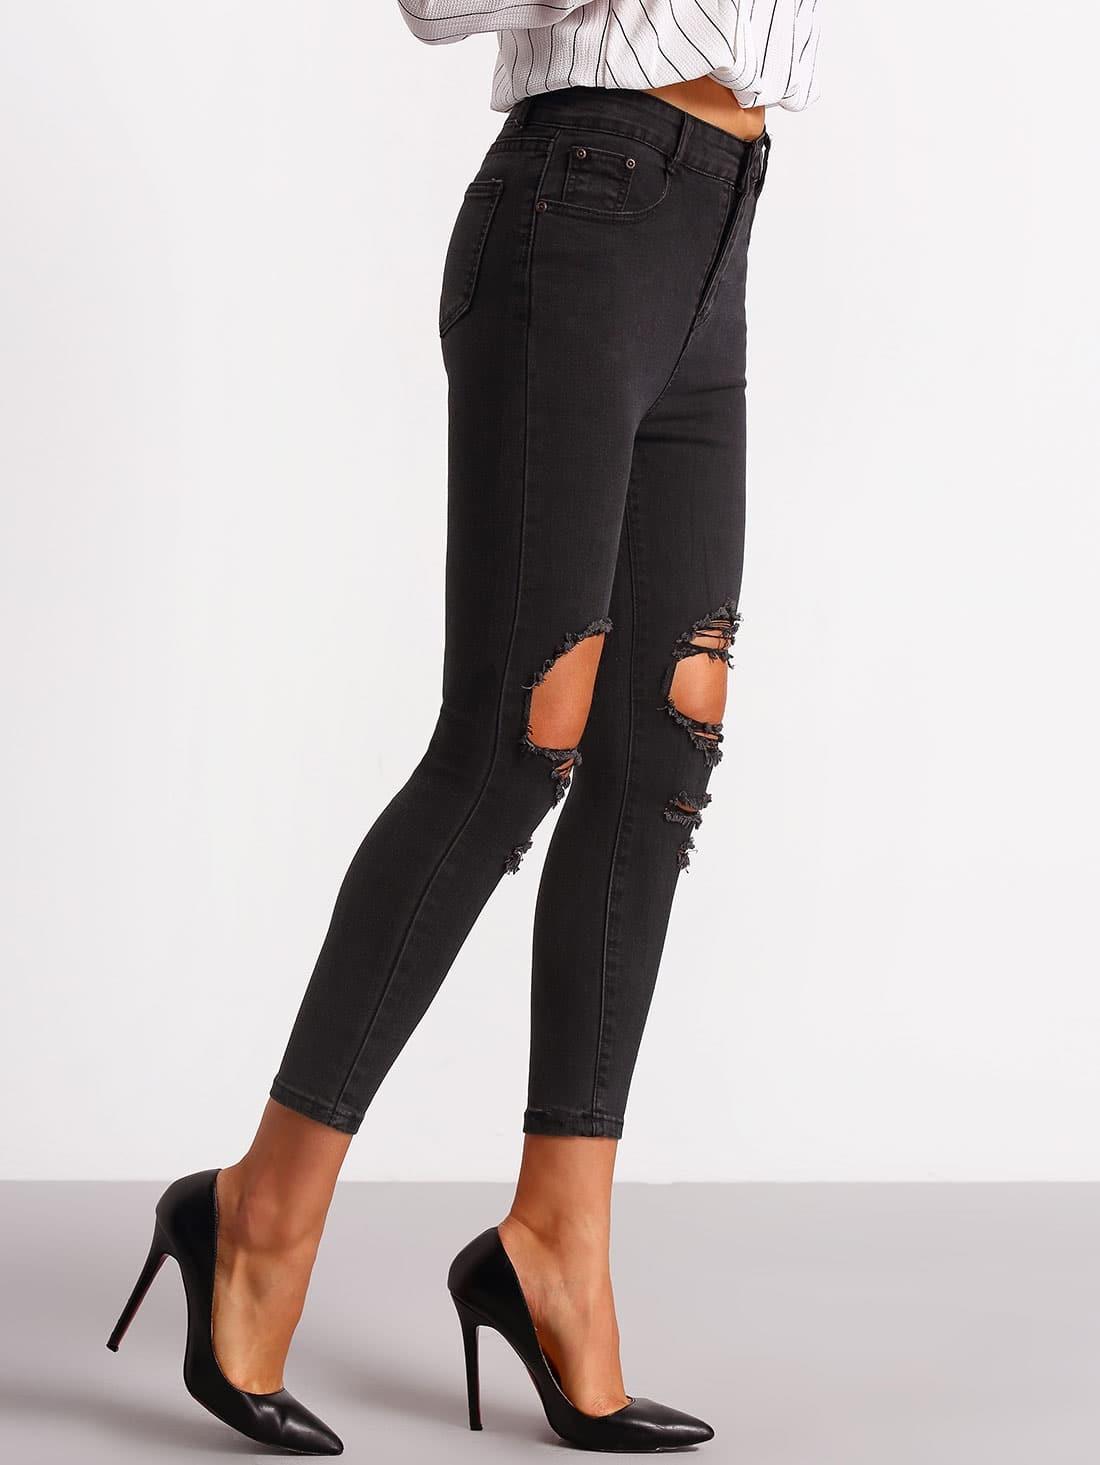 pantalon en denim effet d chir au genou noir french. Black Bedroom Furniture Sets. Home Design Ideas